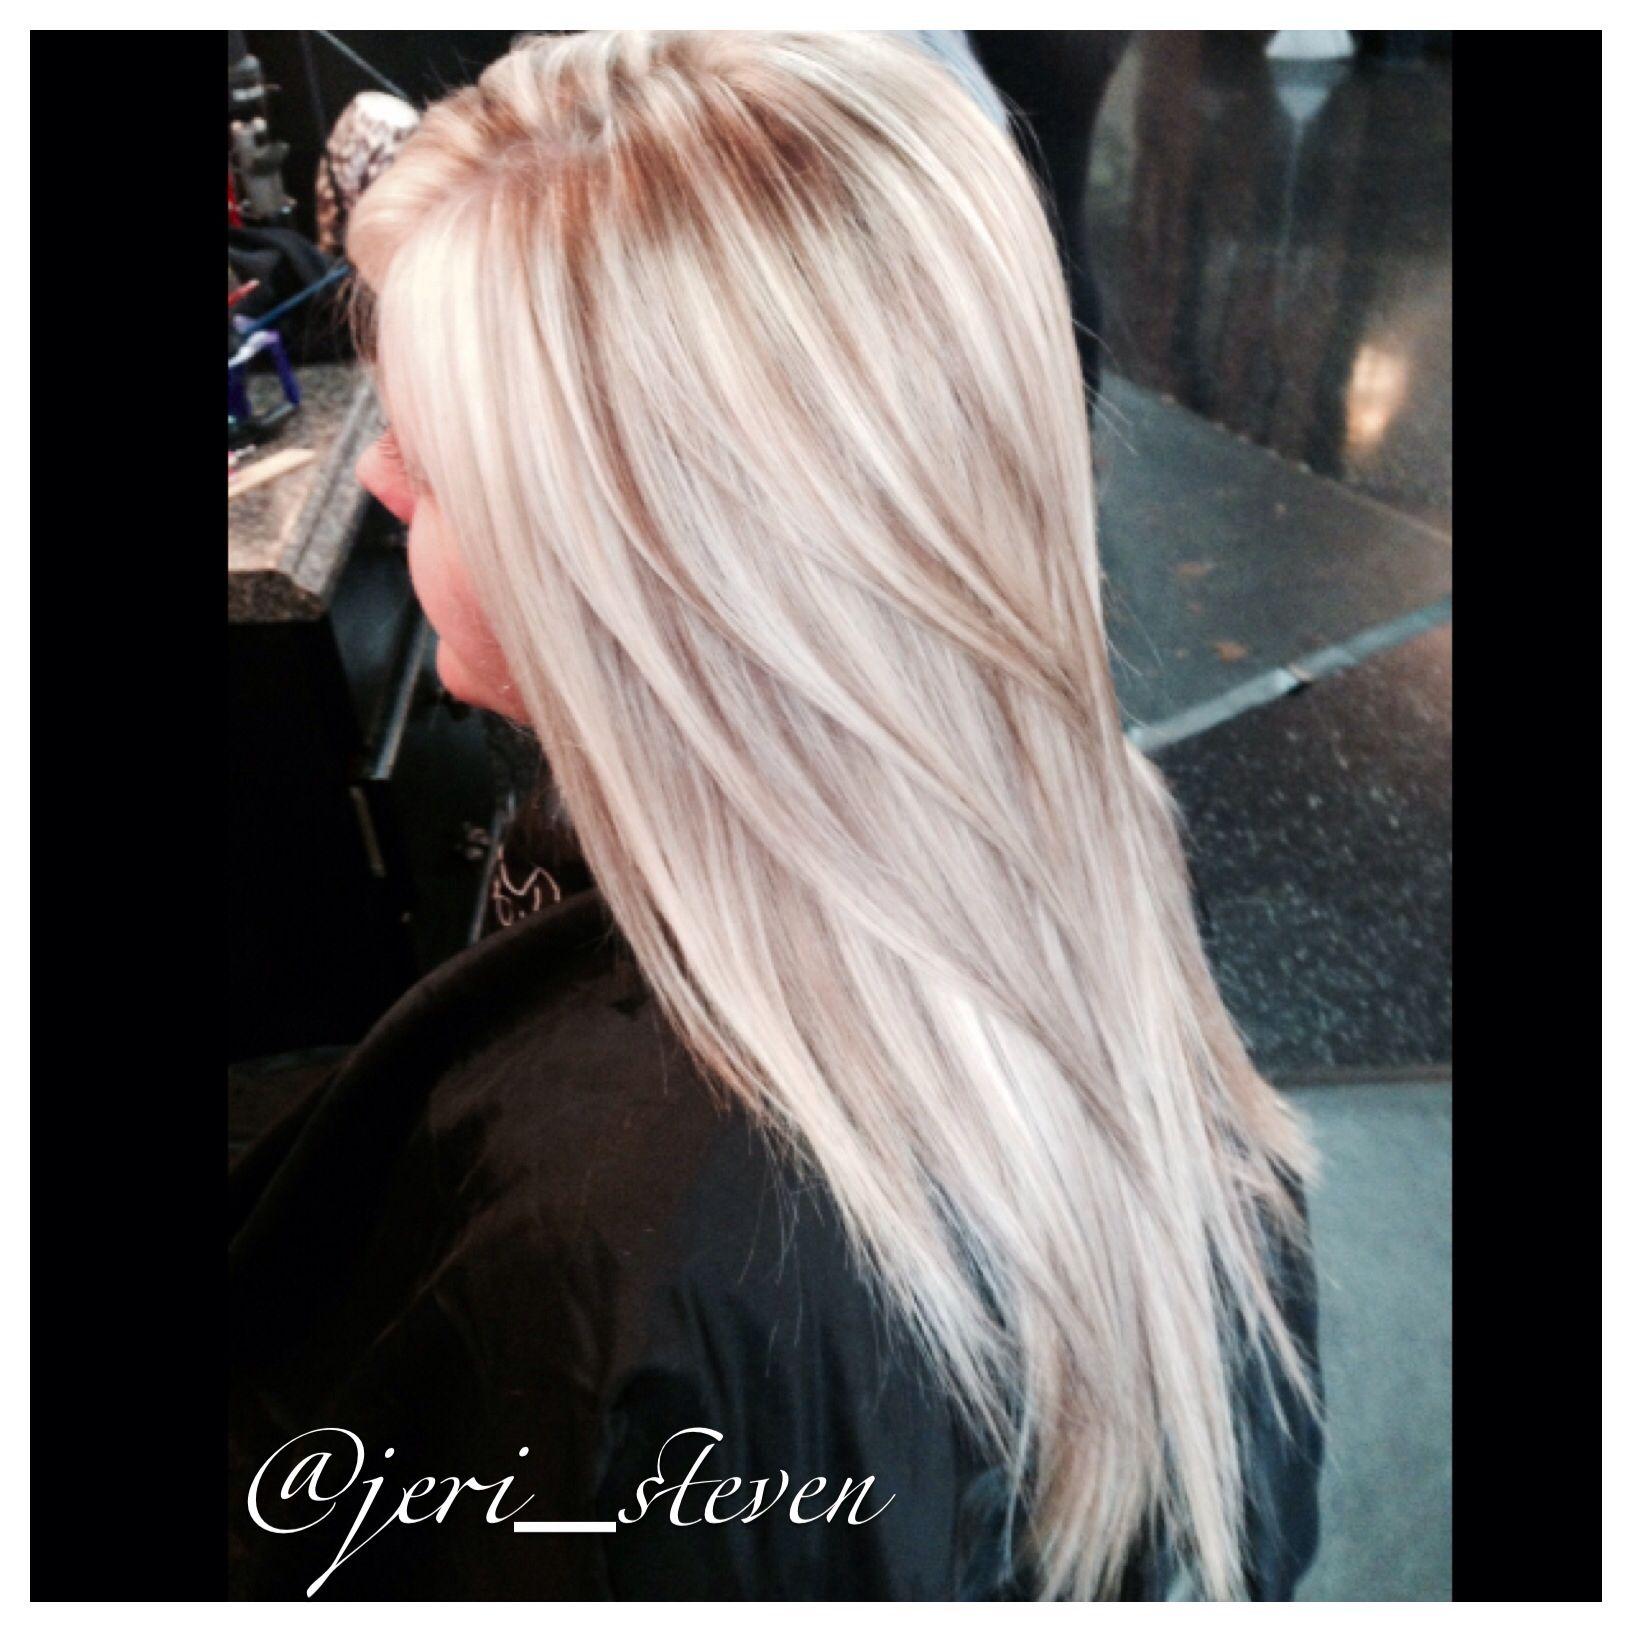 I want blonde blonde hair with light carmel cream highlights 3